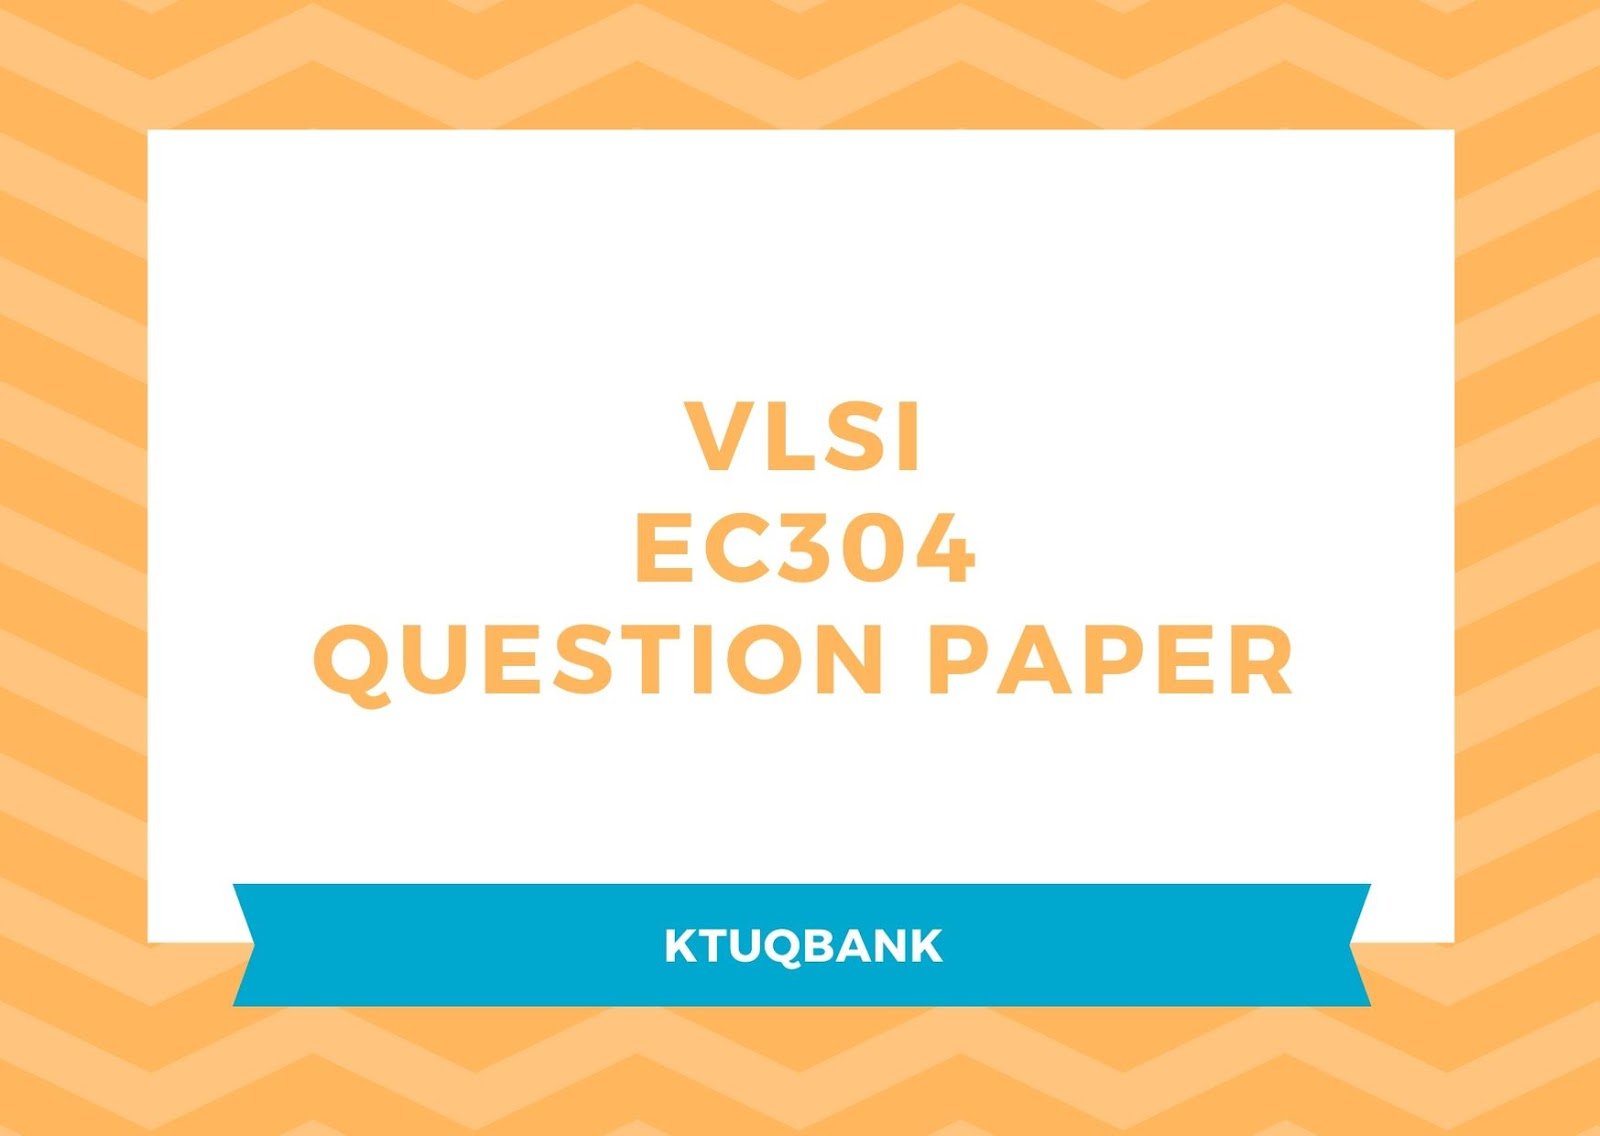 VLSI | EC304 | Question Papers (2015 batch)